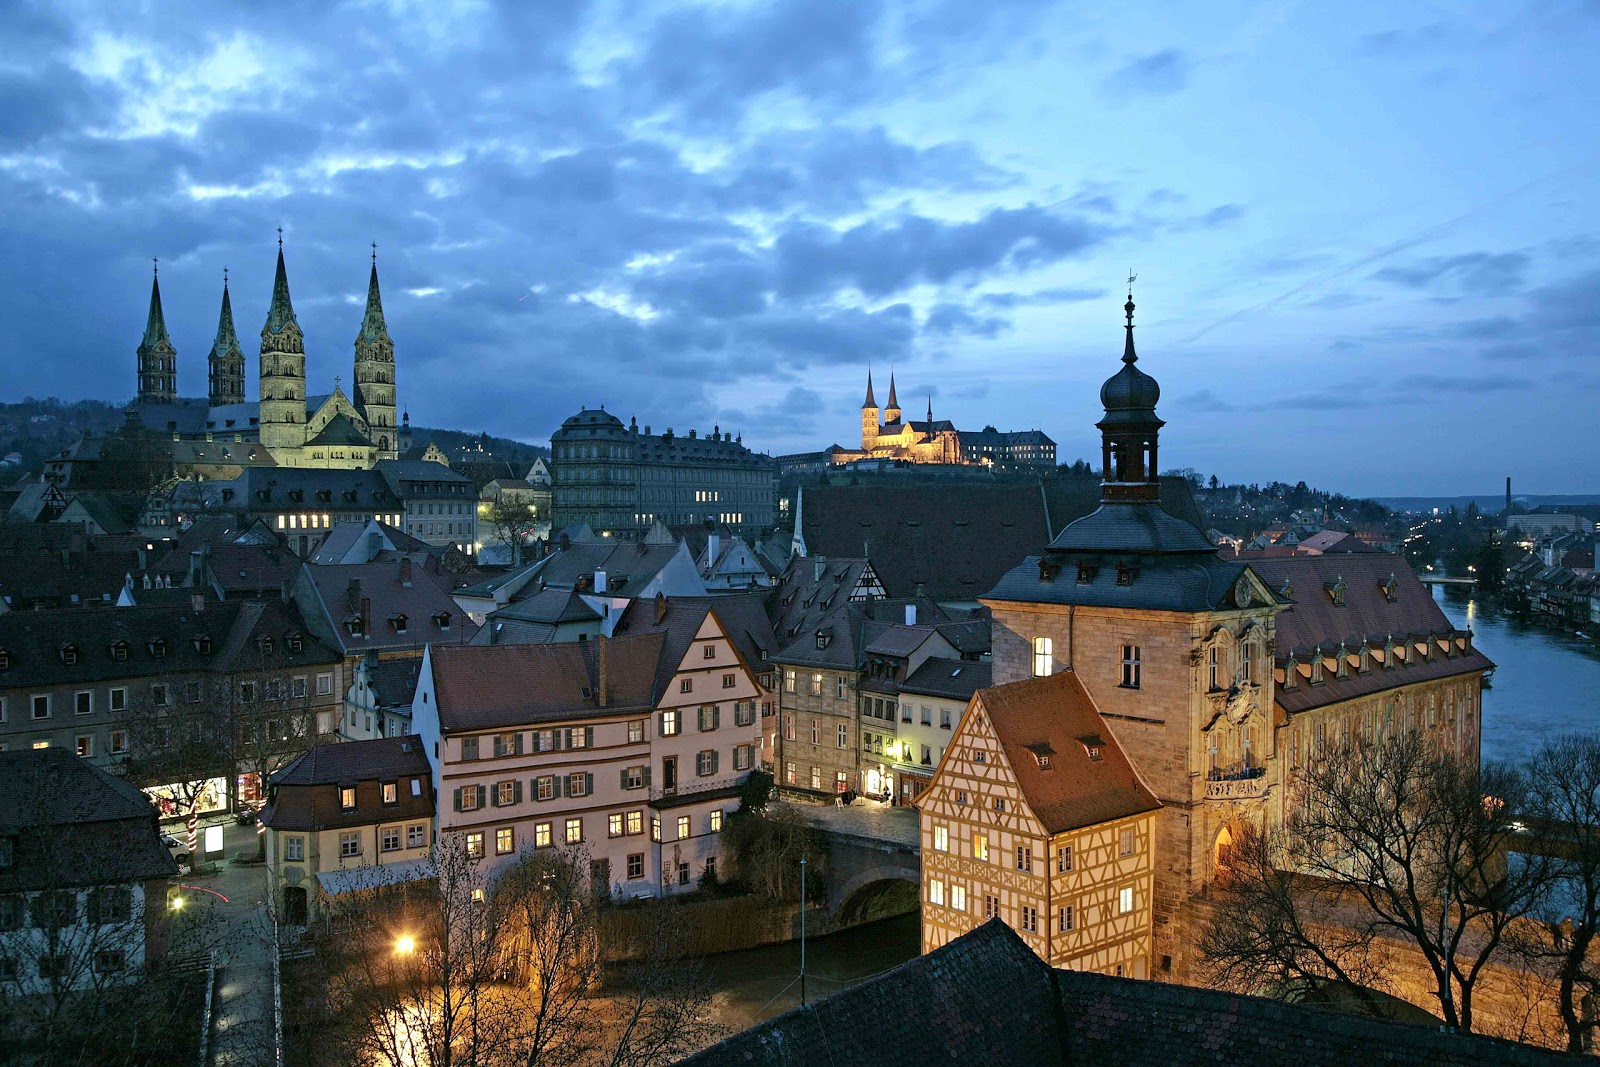 Badausstellung Bamberg germany itinerary 10 days germany forum tripadvisor